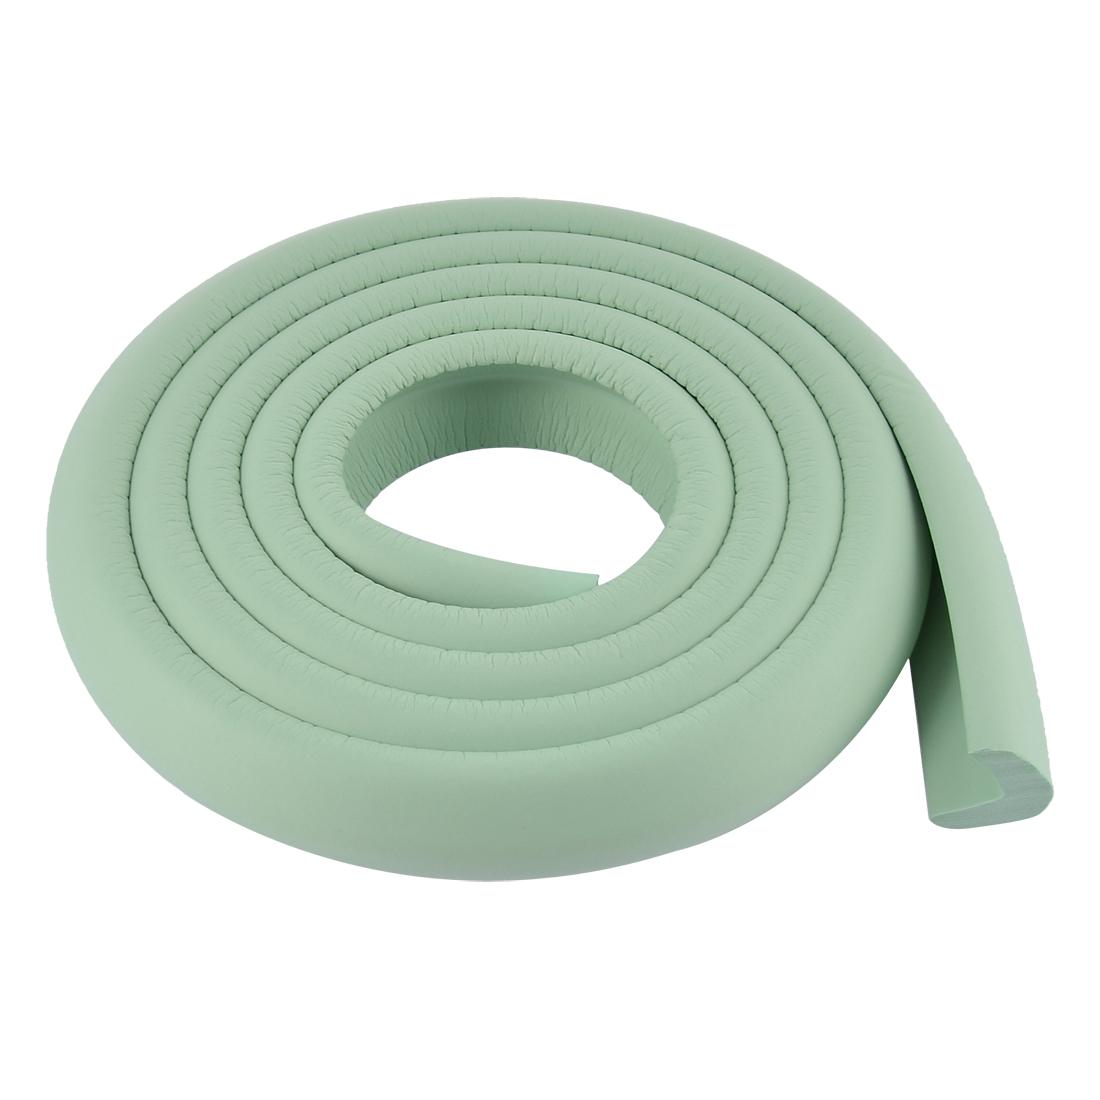 Furniture Corner Edge Protection Cushion Guard 24mm x 8mm Light Green